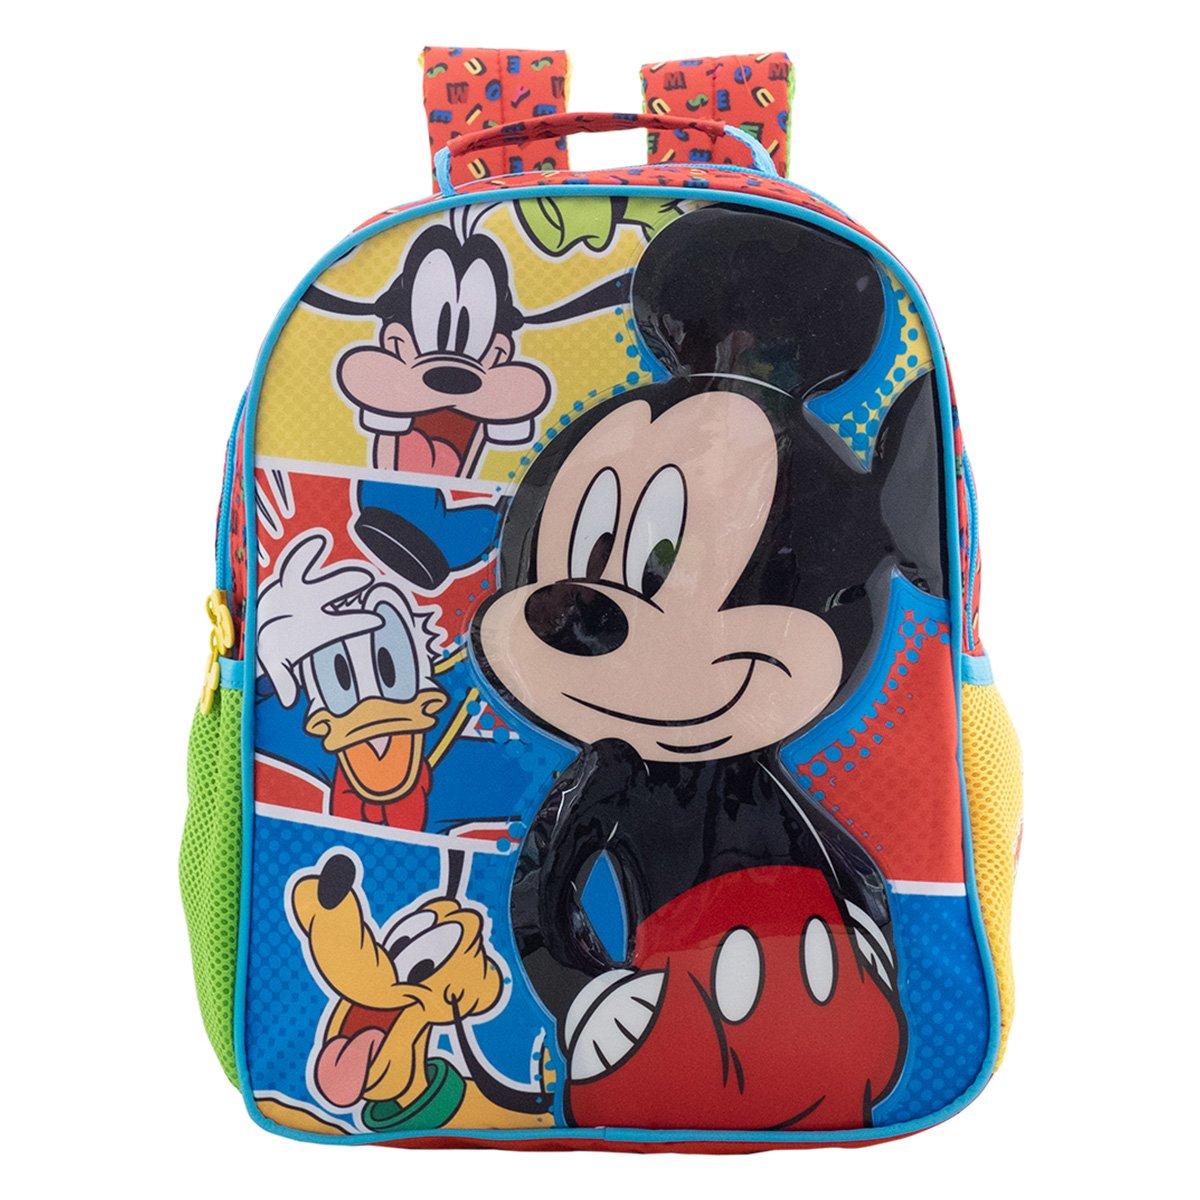 Mochila Xeryus Vermelho/Azul Masculino 9313 Mickey